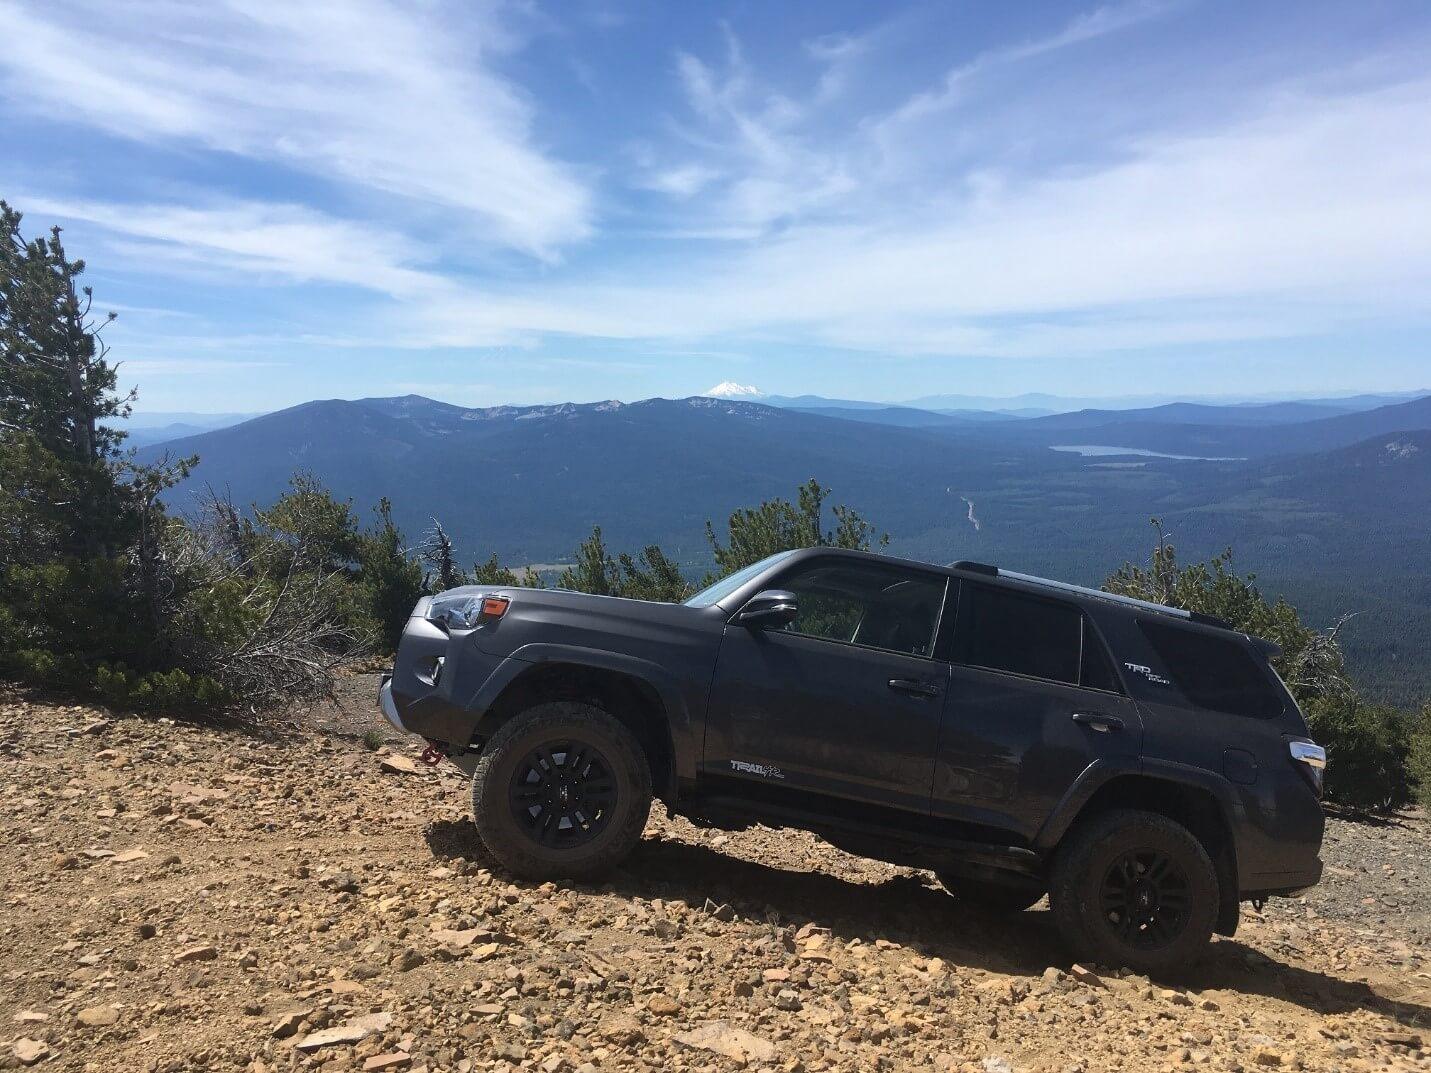 Pelican Butte 4x4 Trail